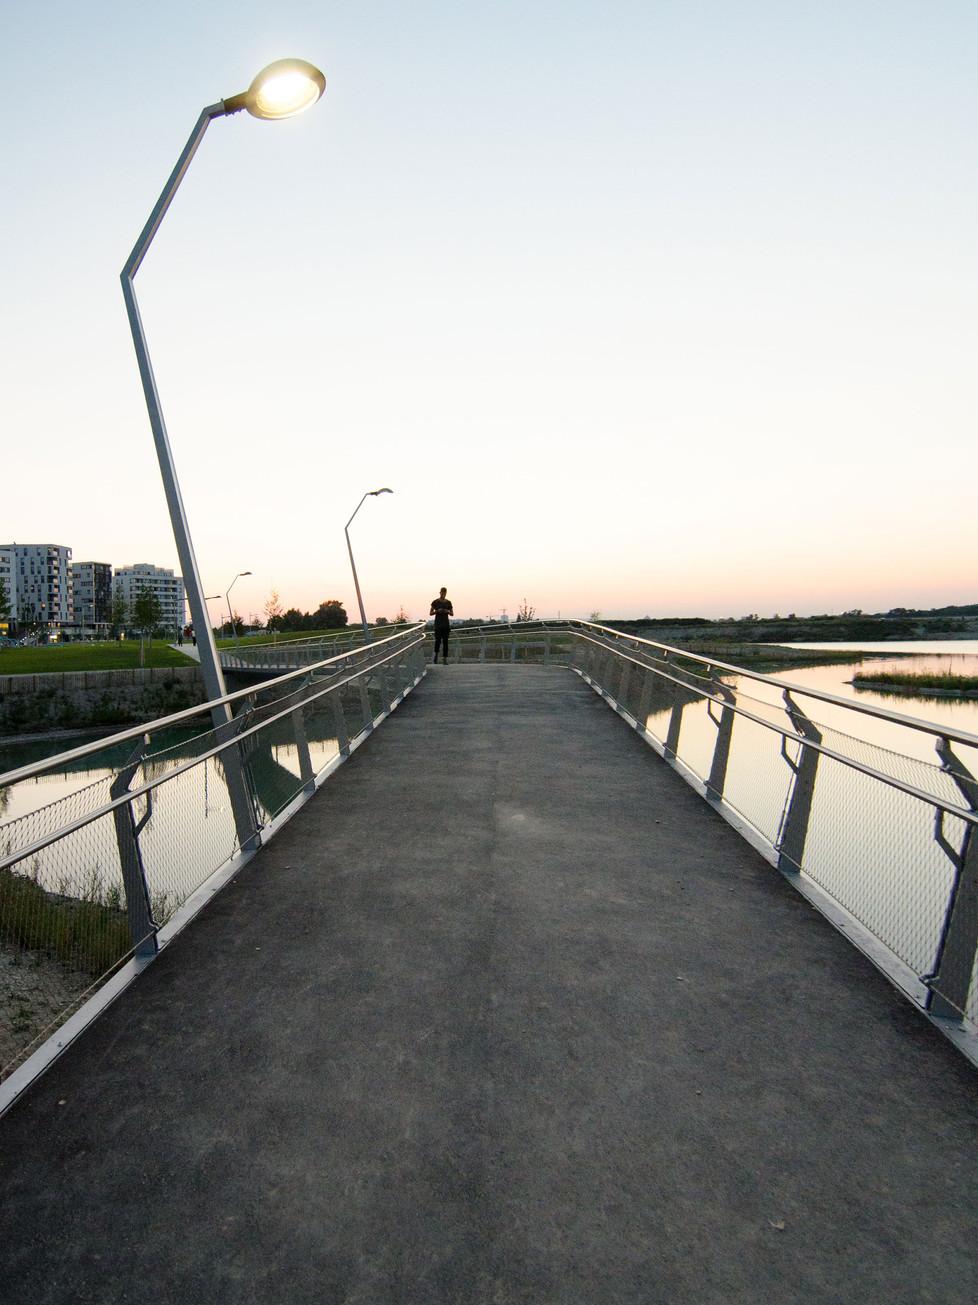 Brücke am Abend